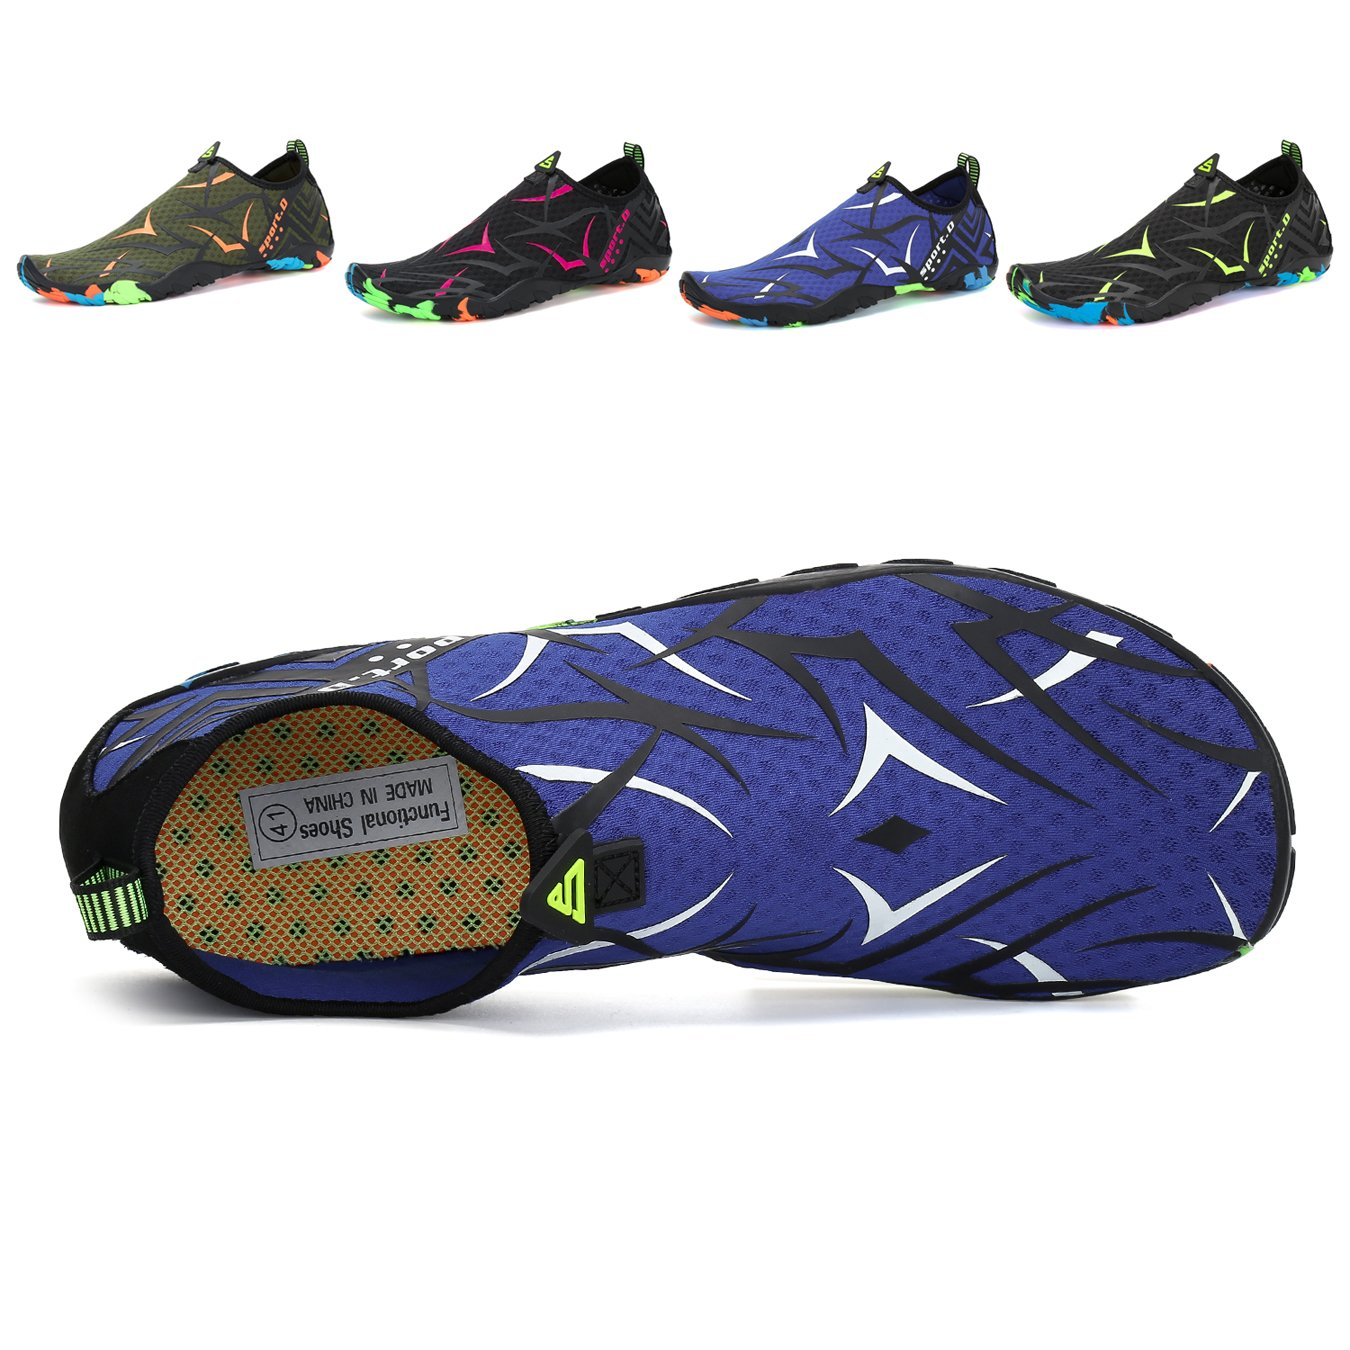 Leaproo Men Women Water Shoes Aqua Socks Barefoot Swim Yoga Surf Shoes for Beach Pool Diving Walking